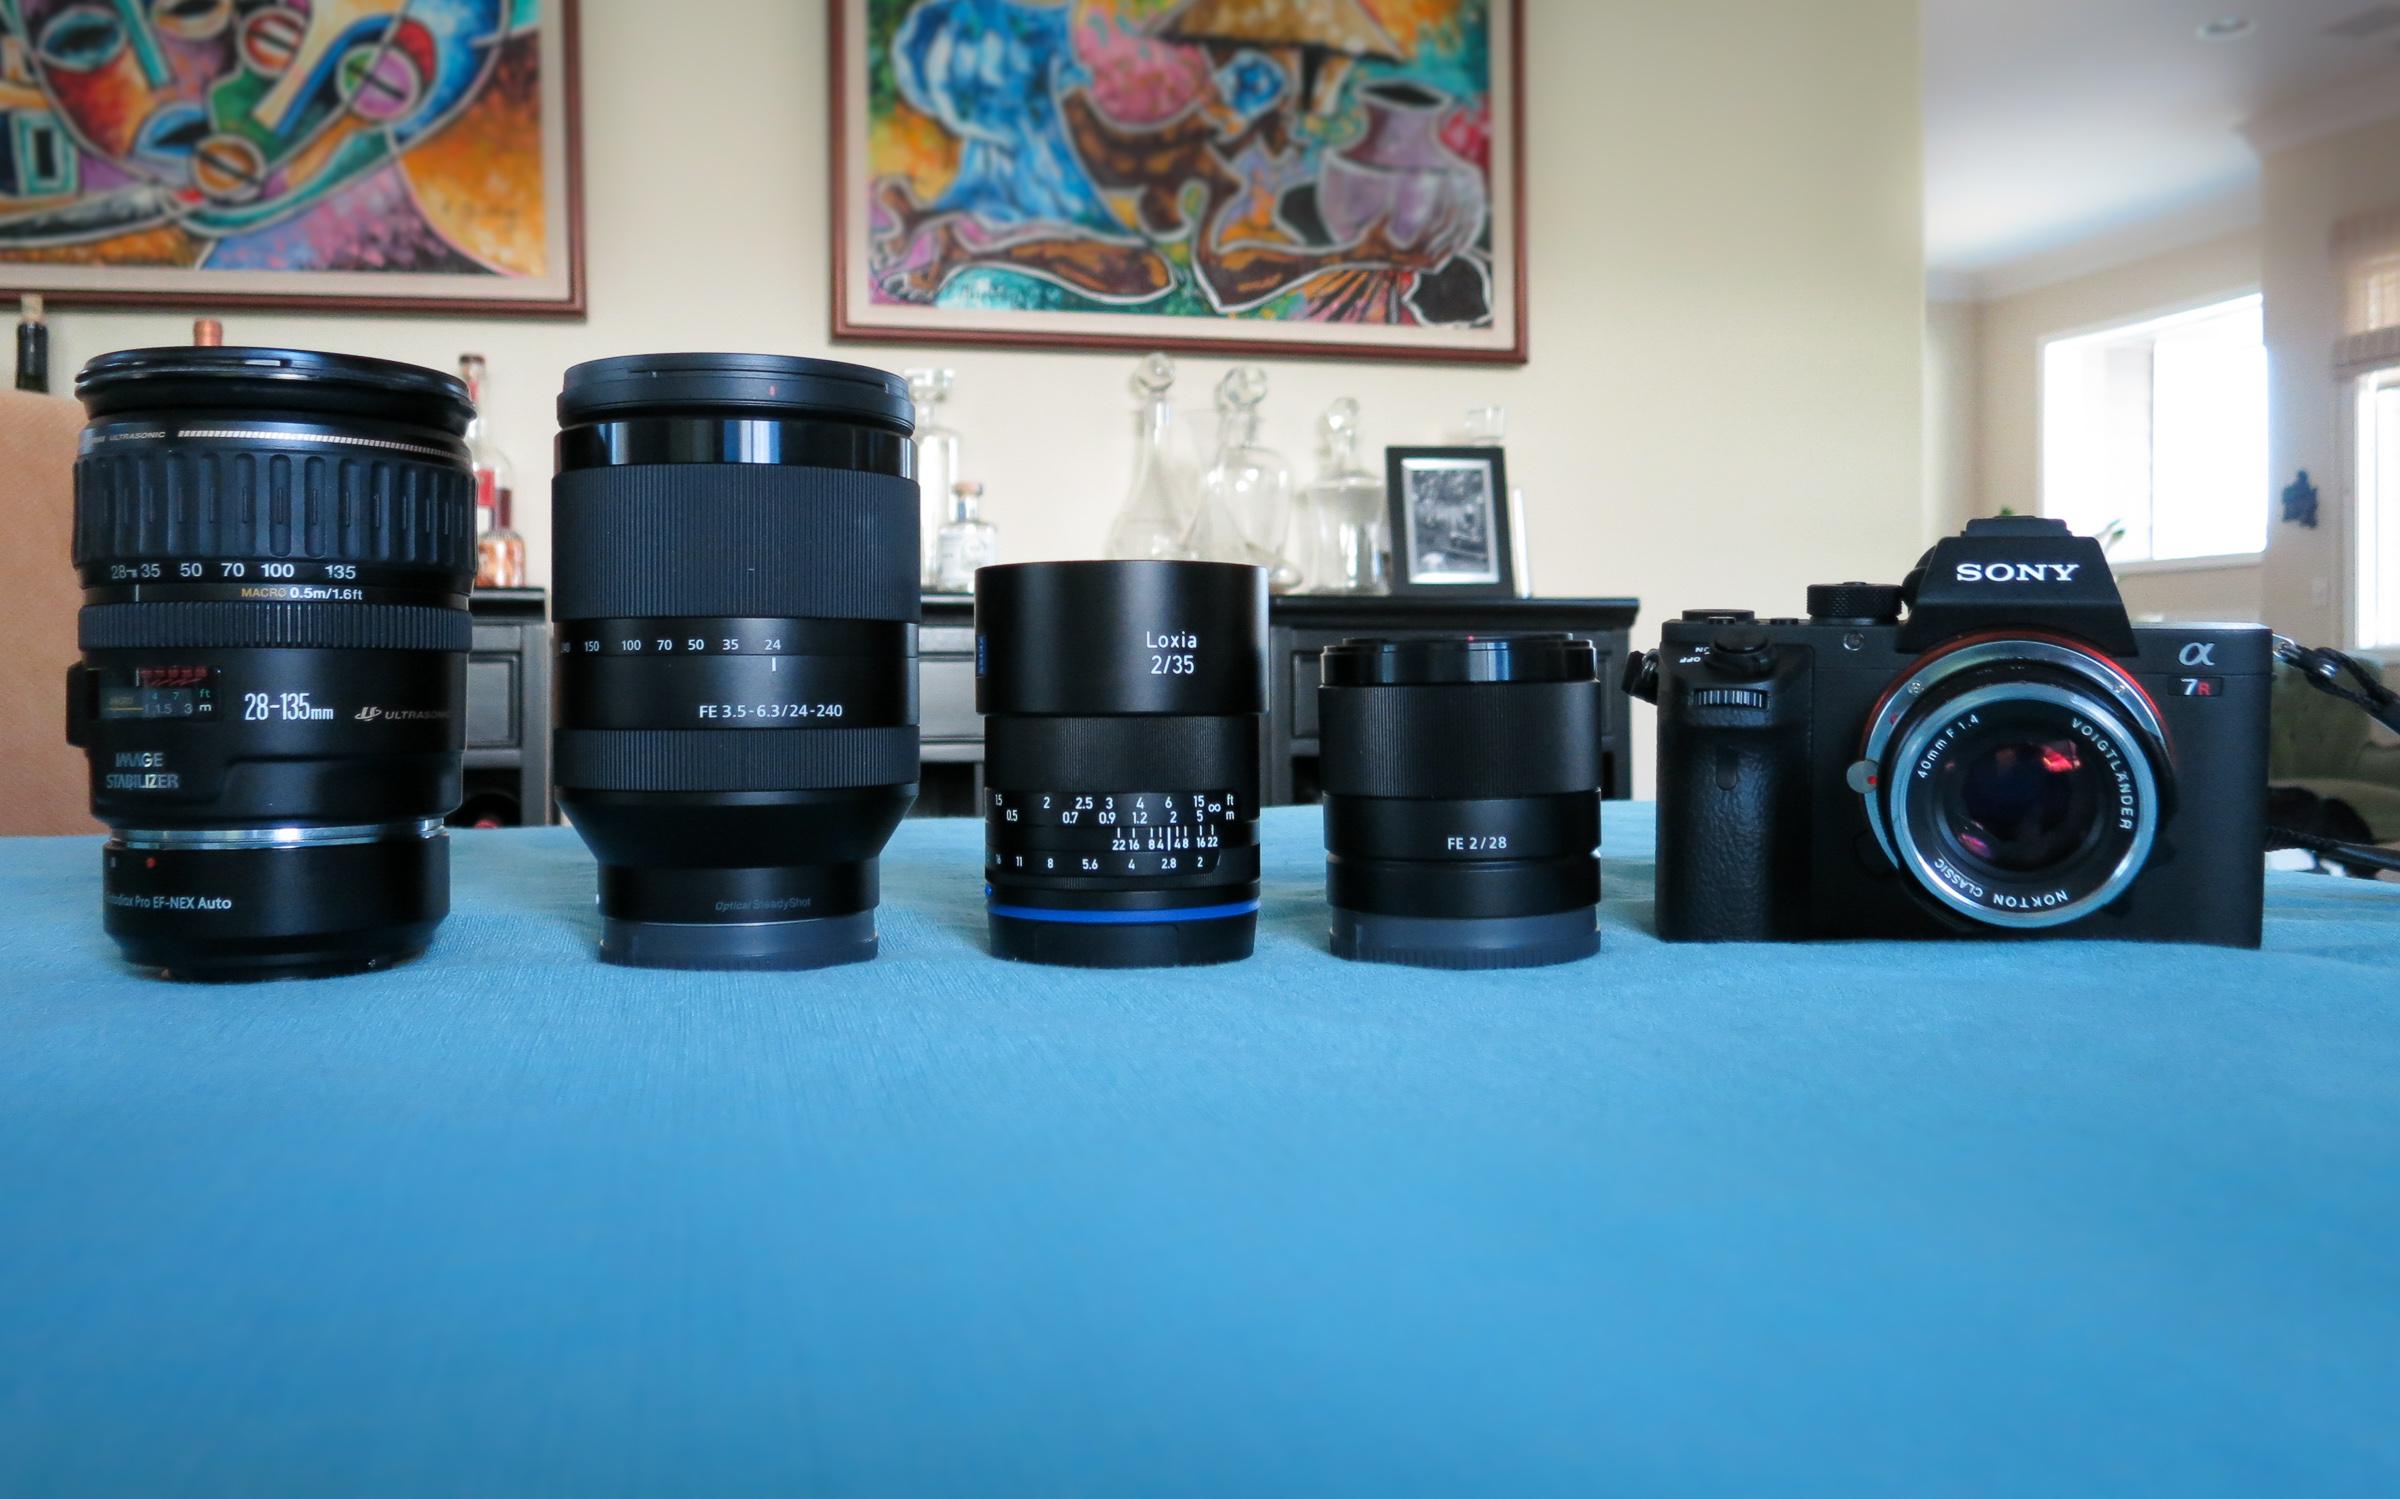 Sony a7Rii + Lenses